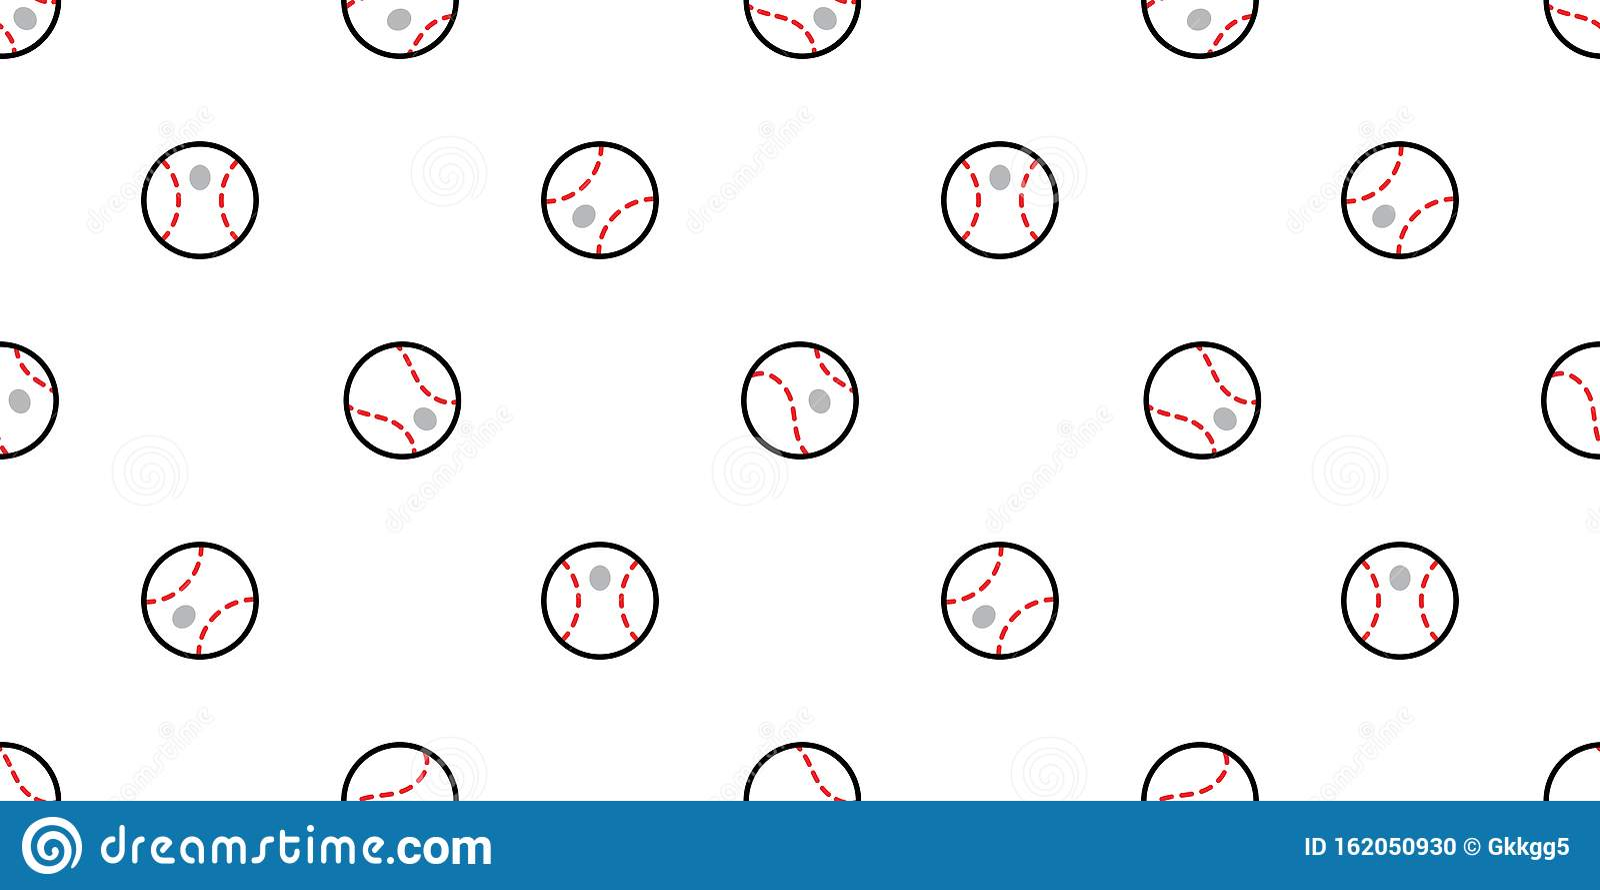 Pattern For Sport Wallpaper: Baseball Seamless Pattern Ball Vector Softball Sport